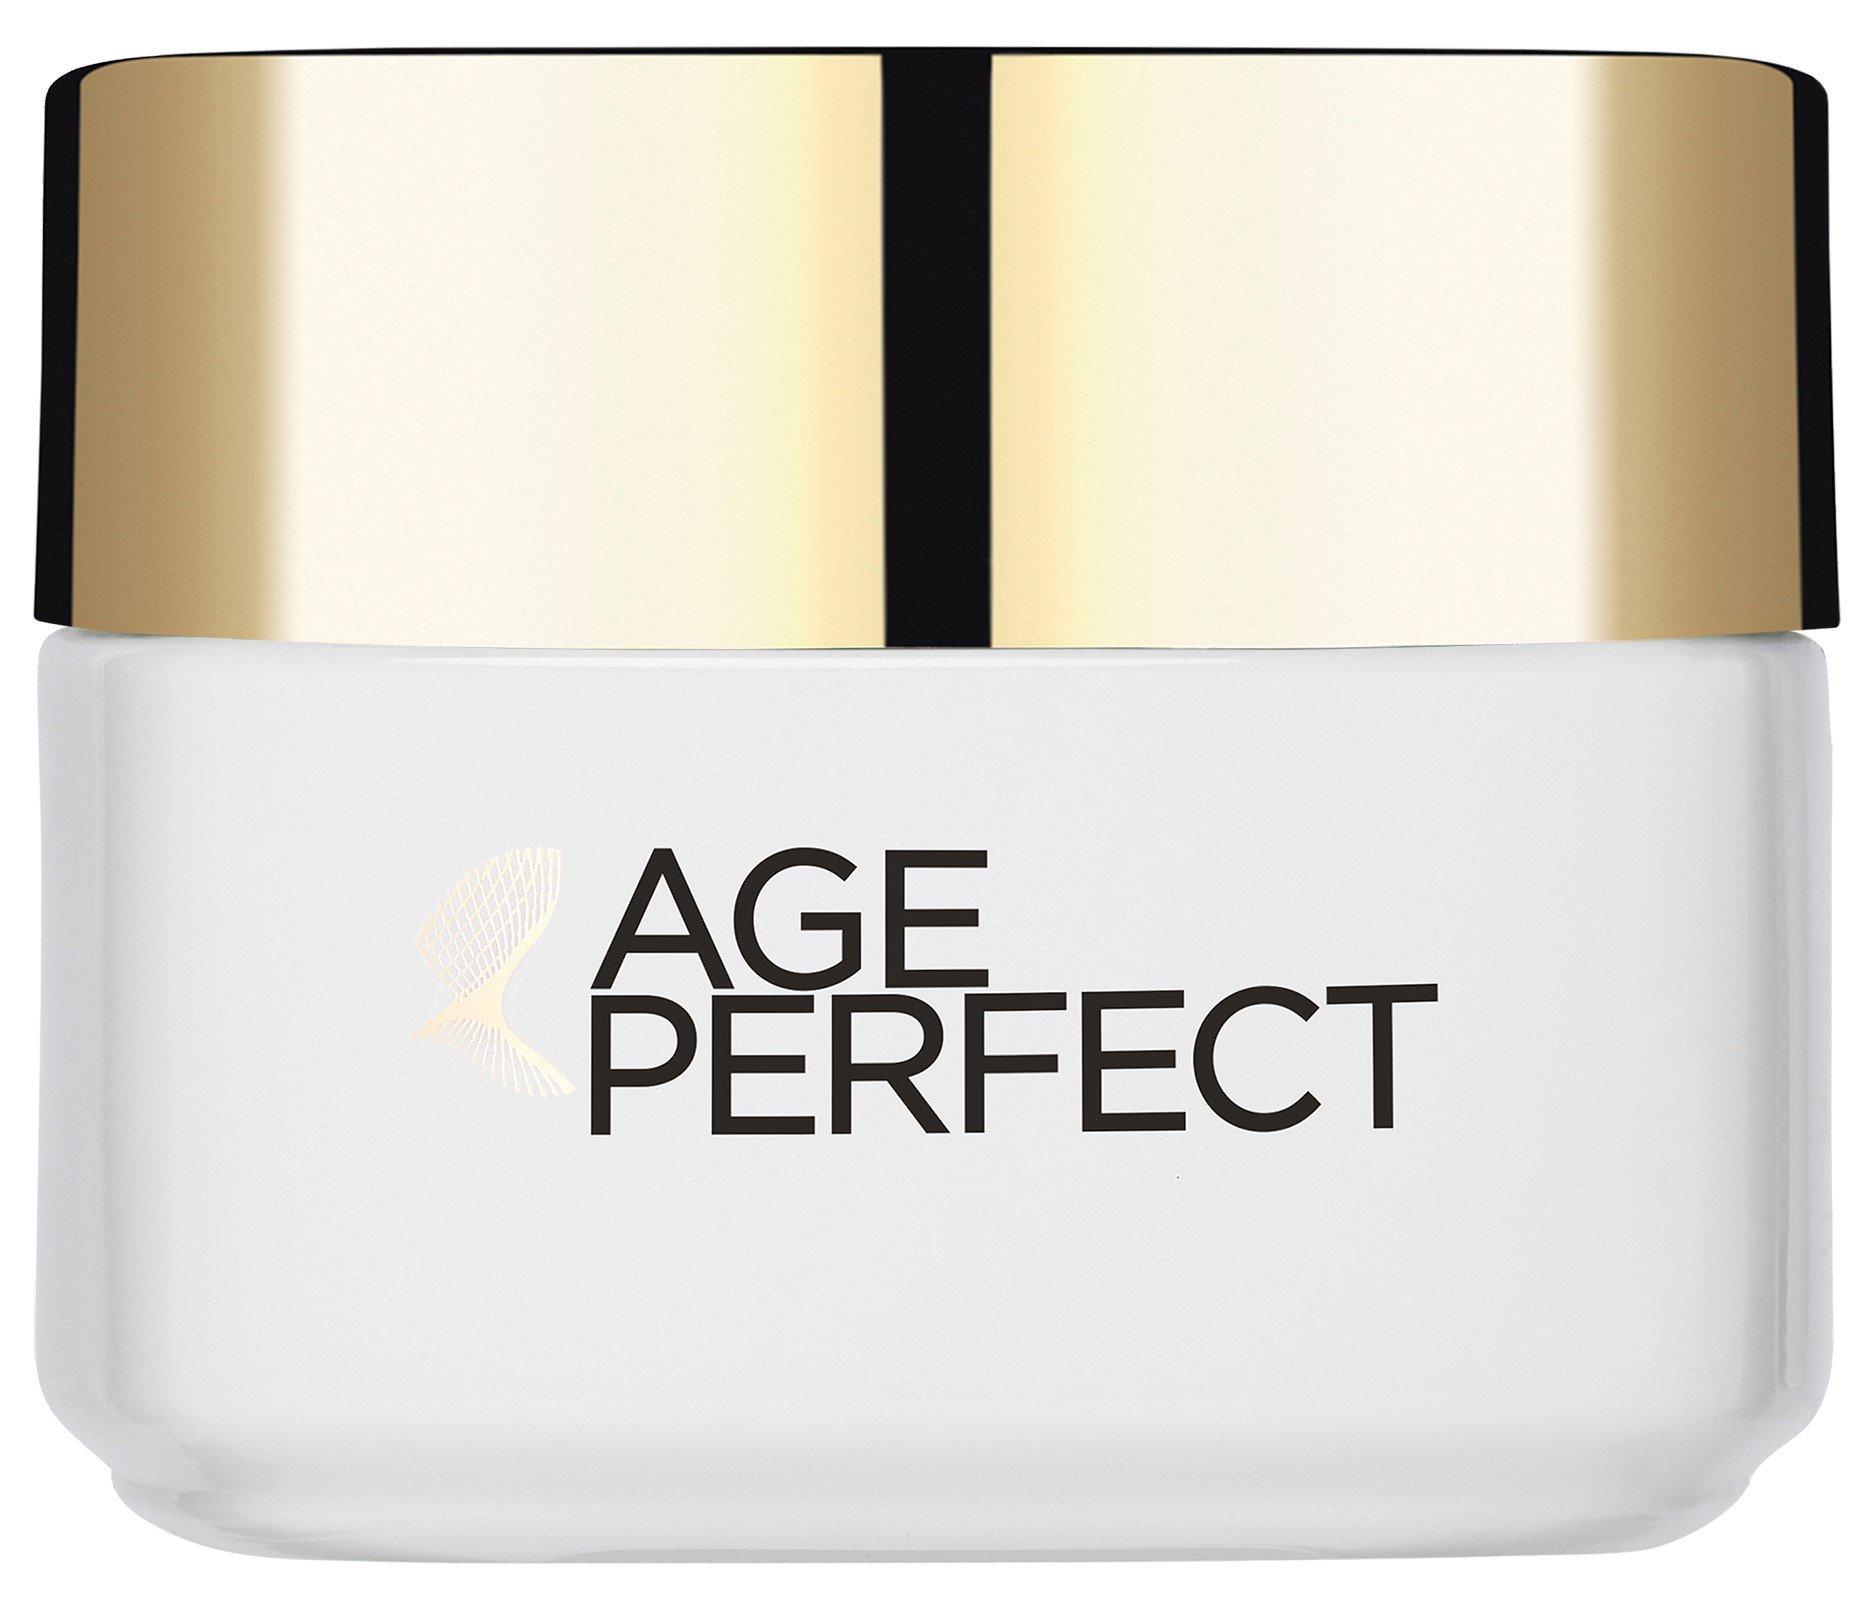 L'Oréal - Age Perfect Moisturising Eye Care Anti-Sagging 15 ml